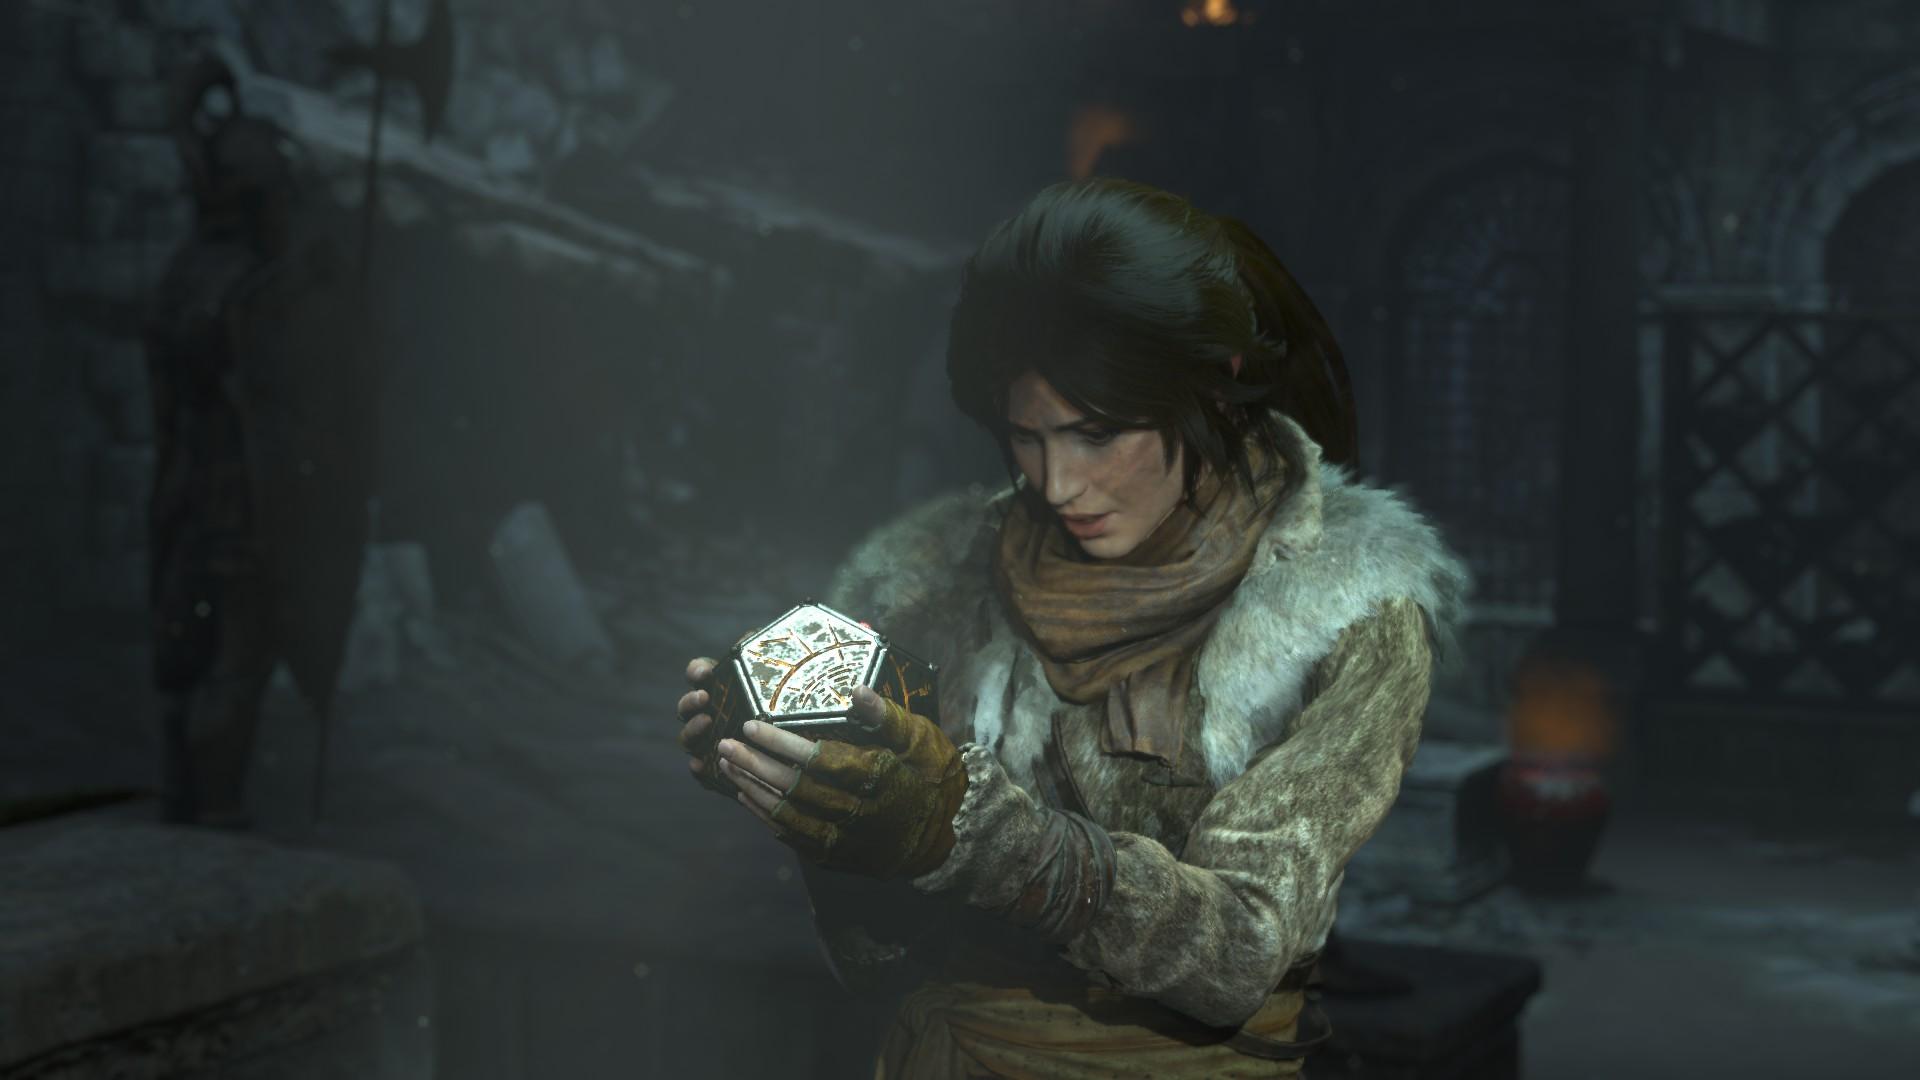 20171229172941_1.jpg - Rise of the Tomb Raider